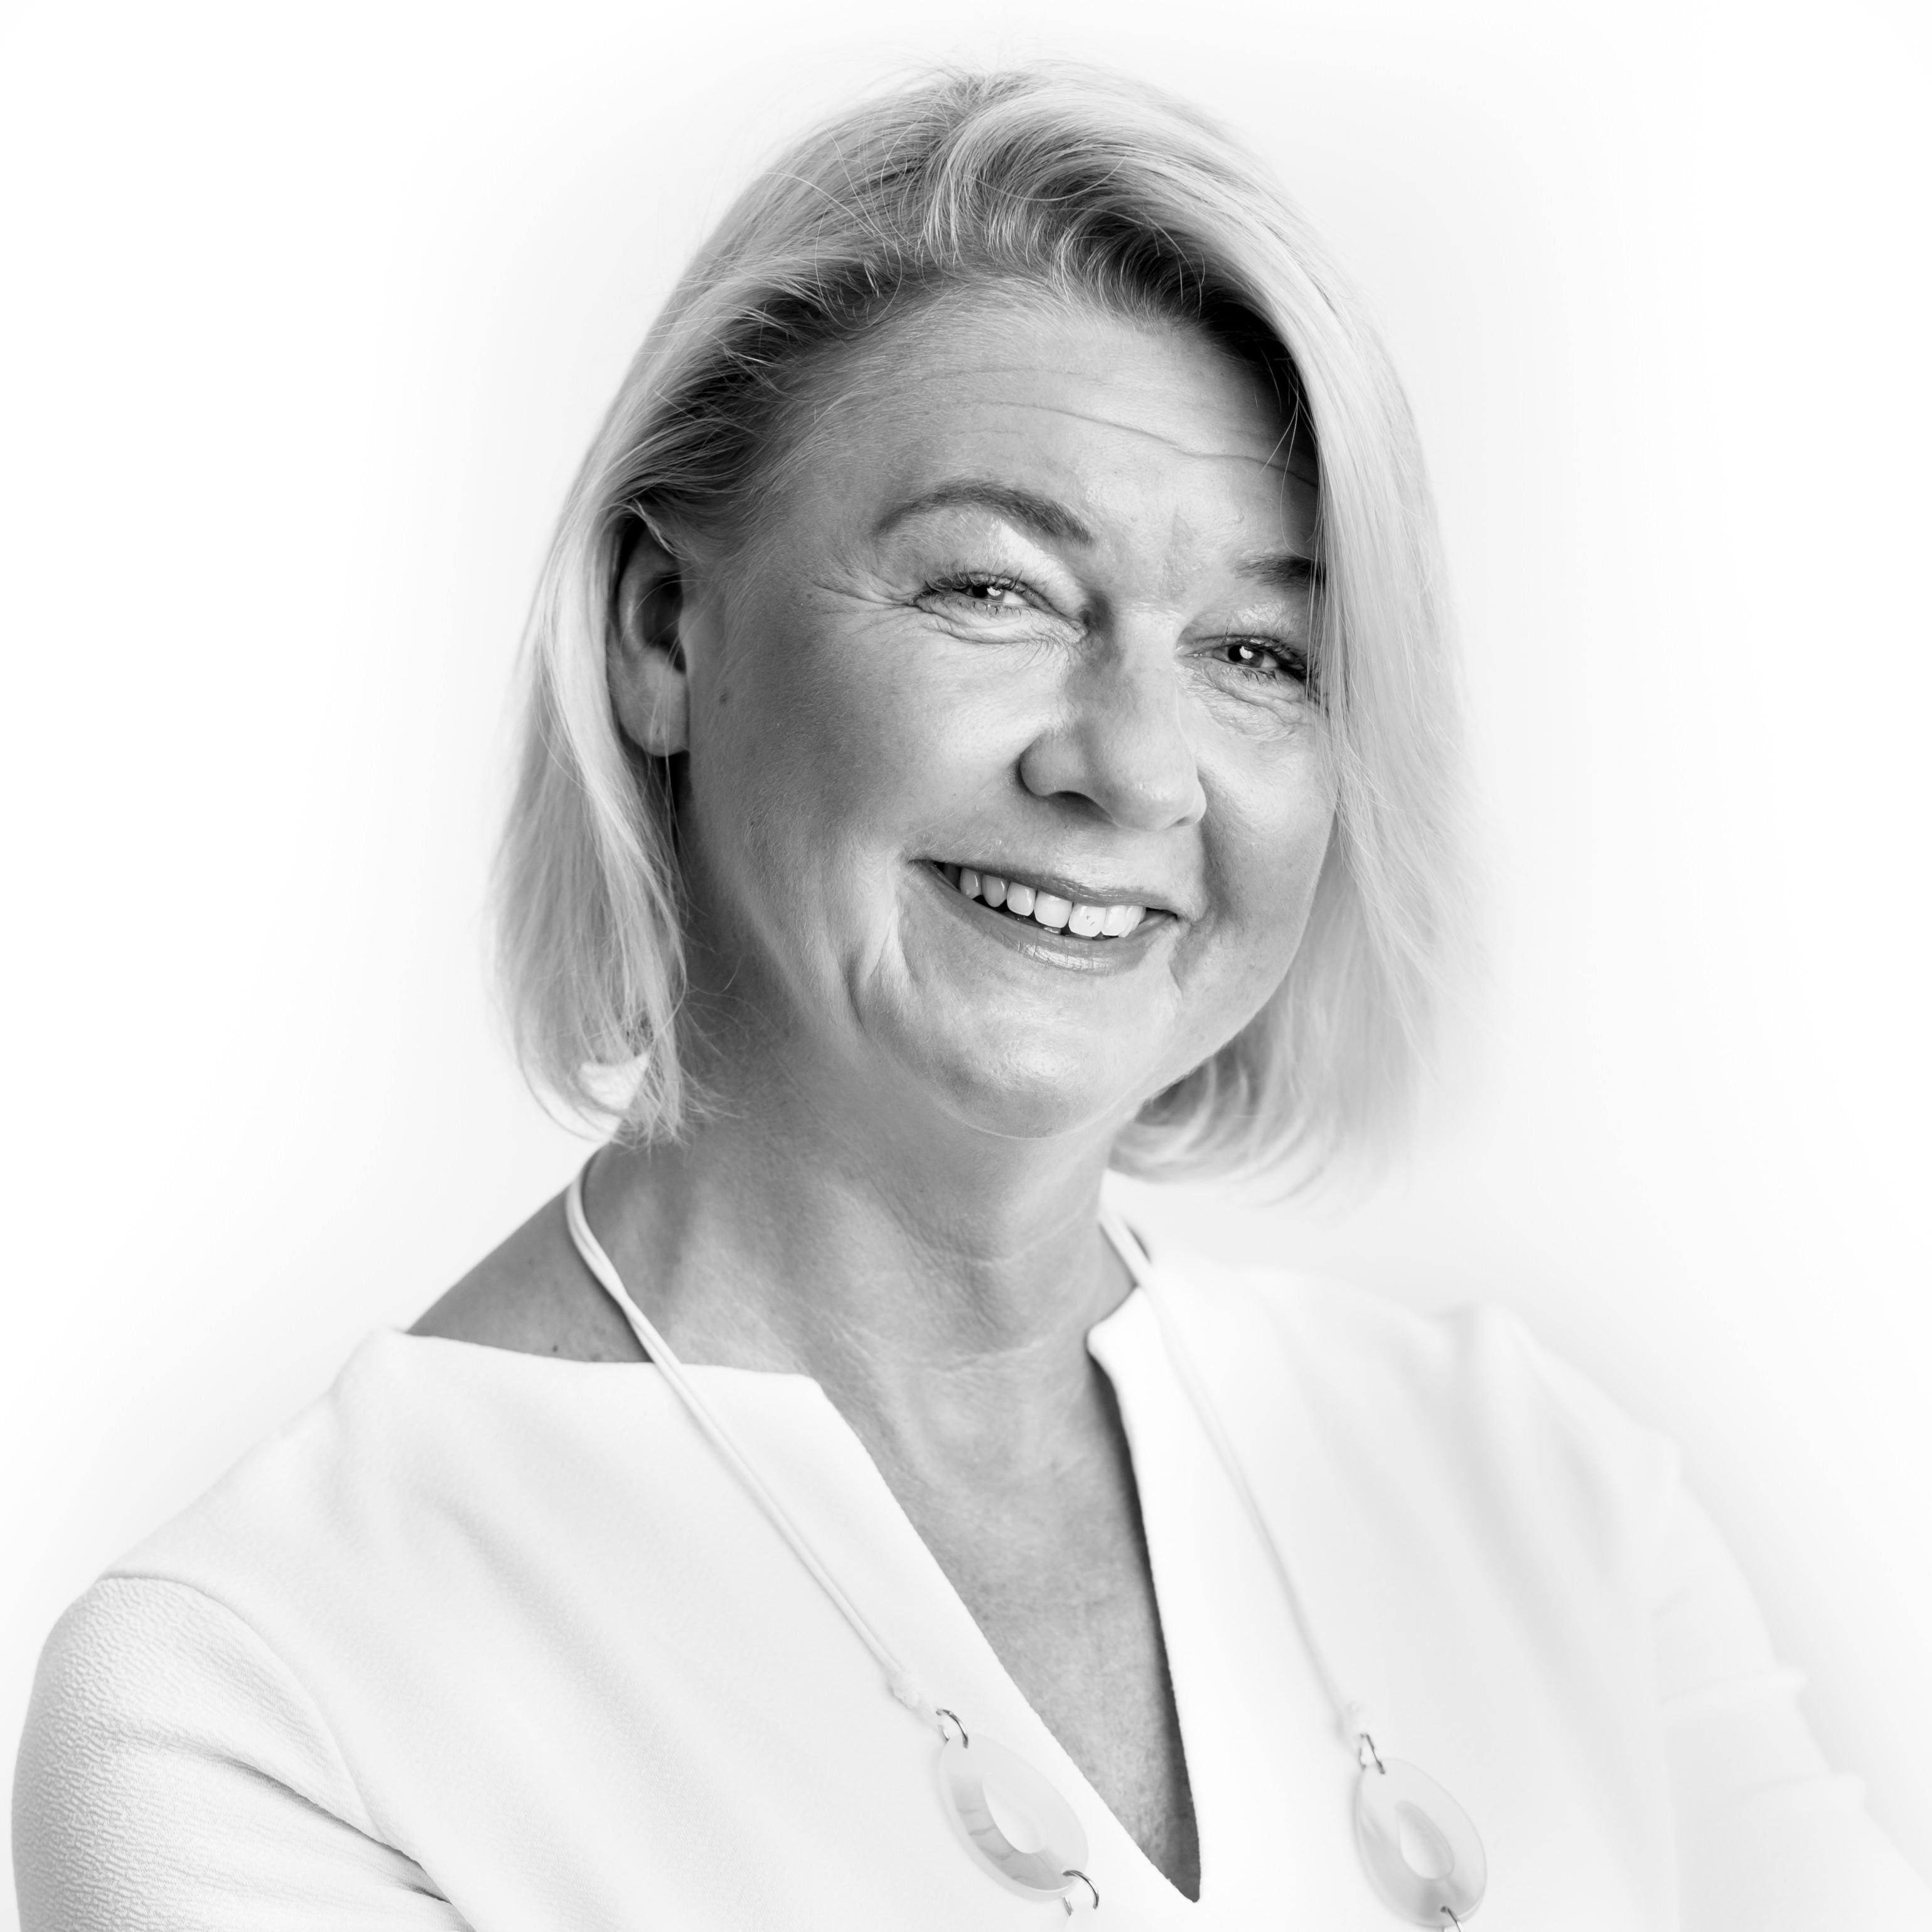 Diana Zeevat-Hulst